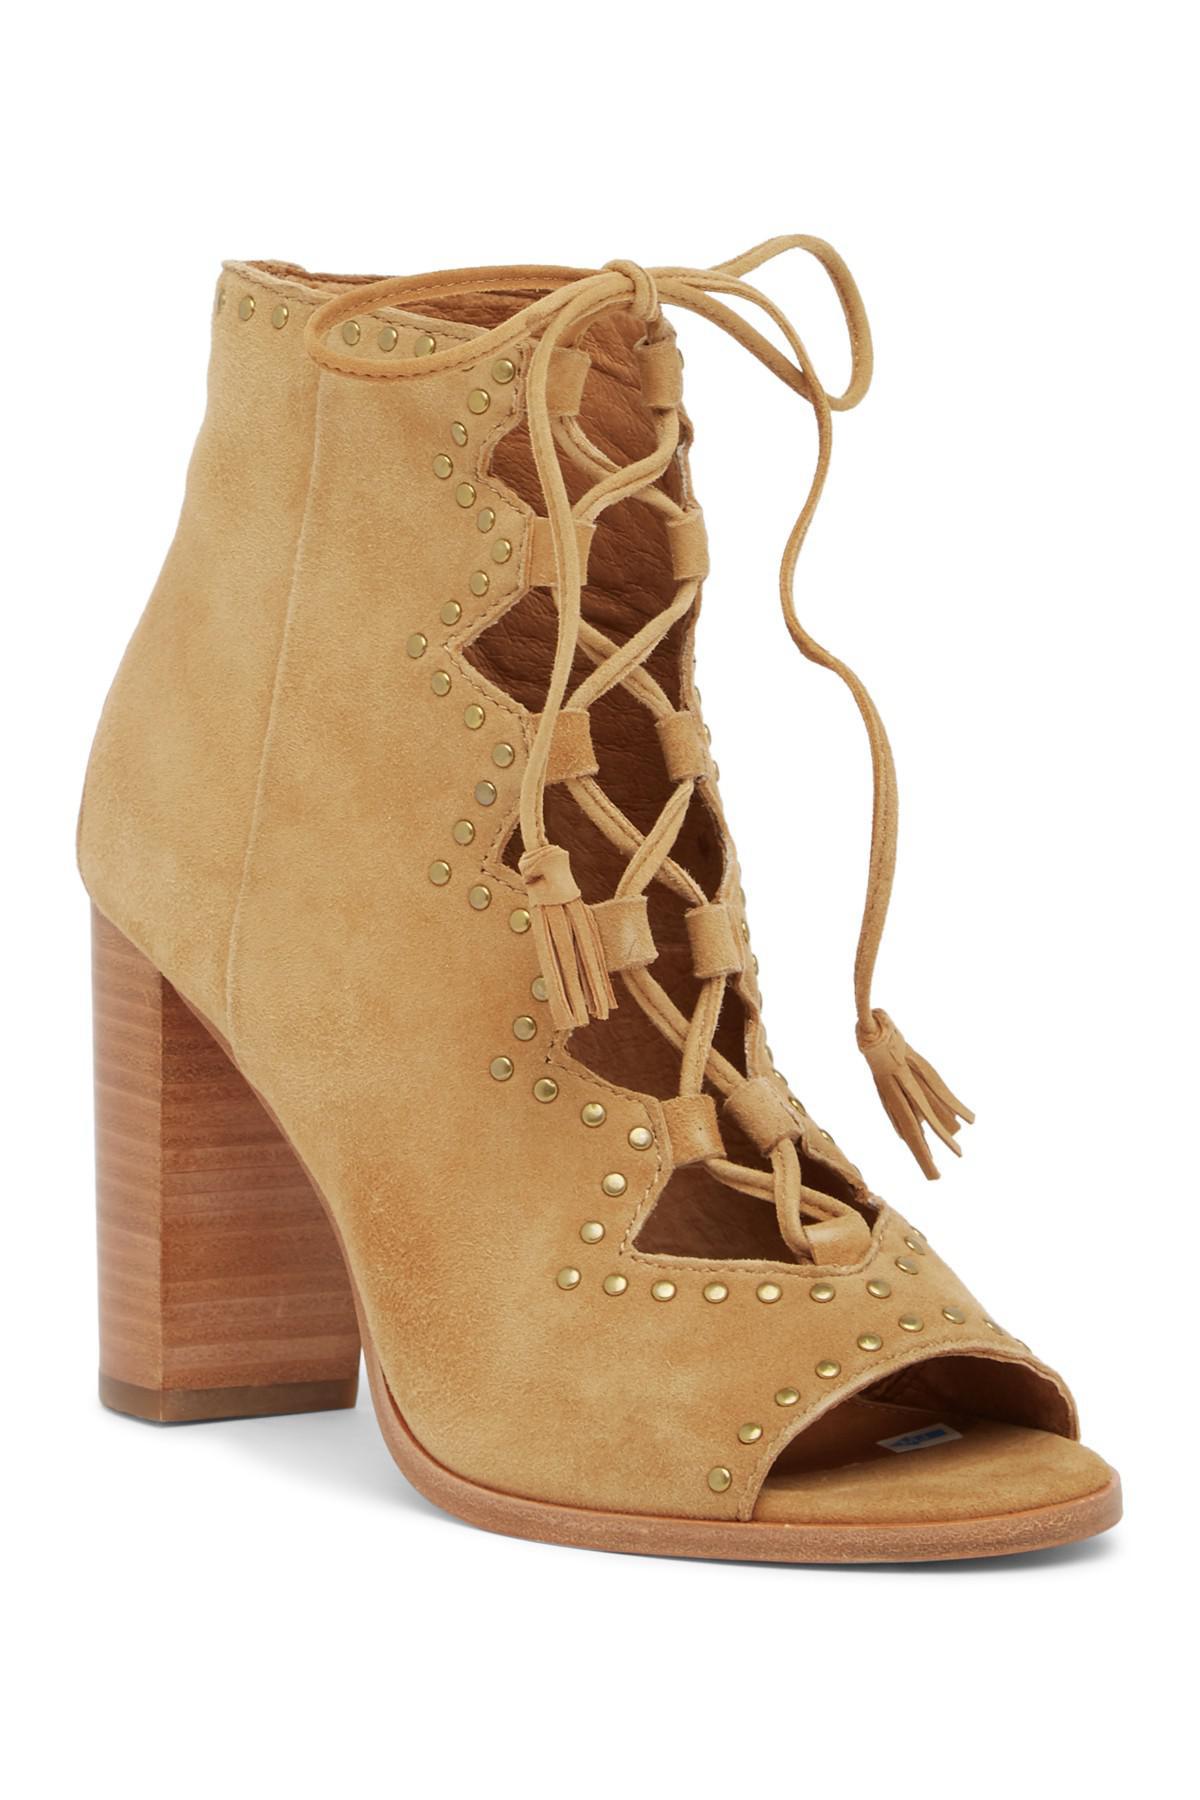 Frye Gabby Ghillie Studded Sandal eapa7nDw